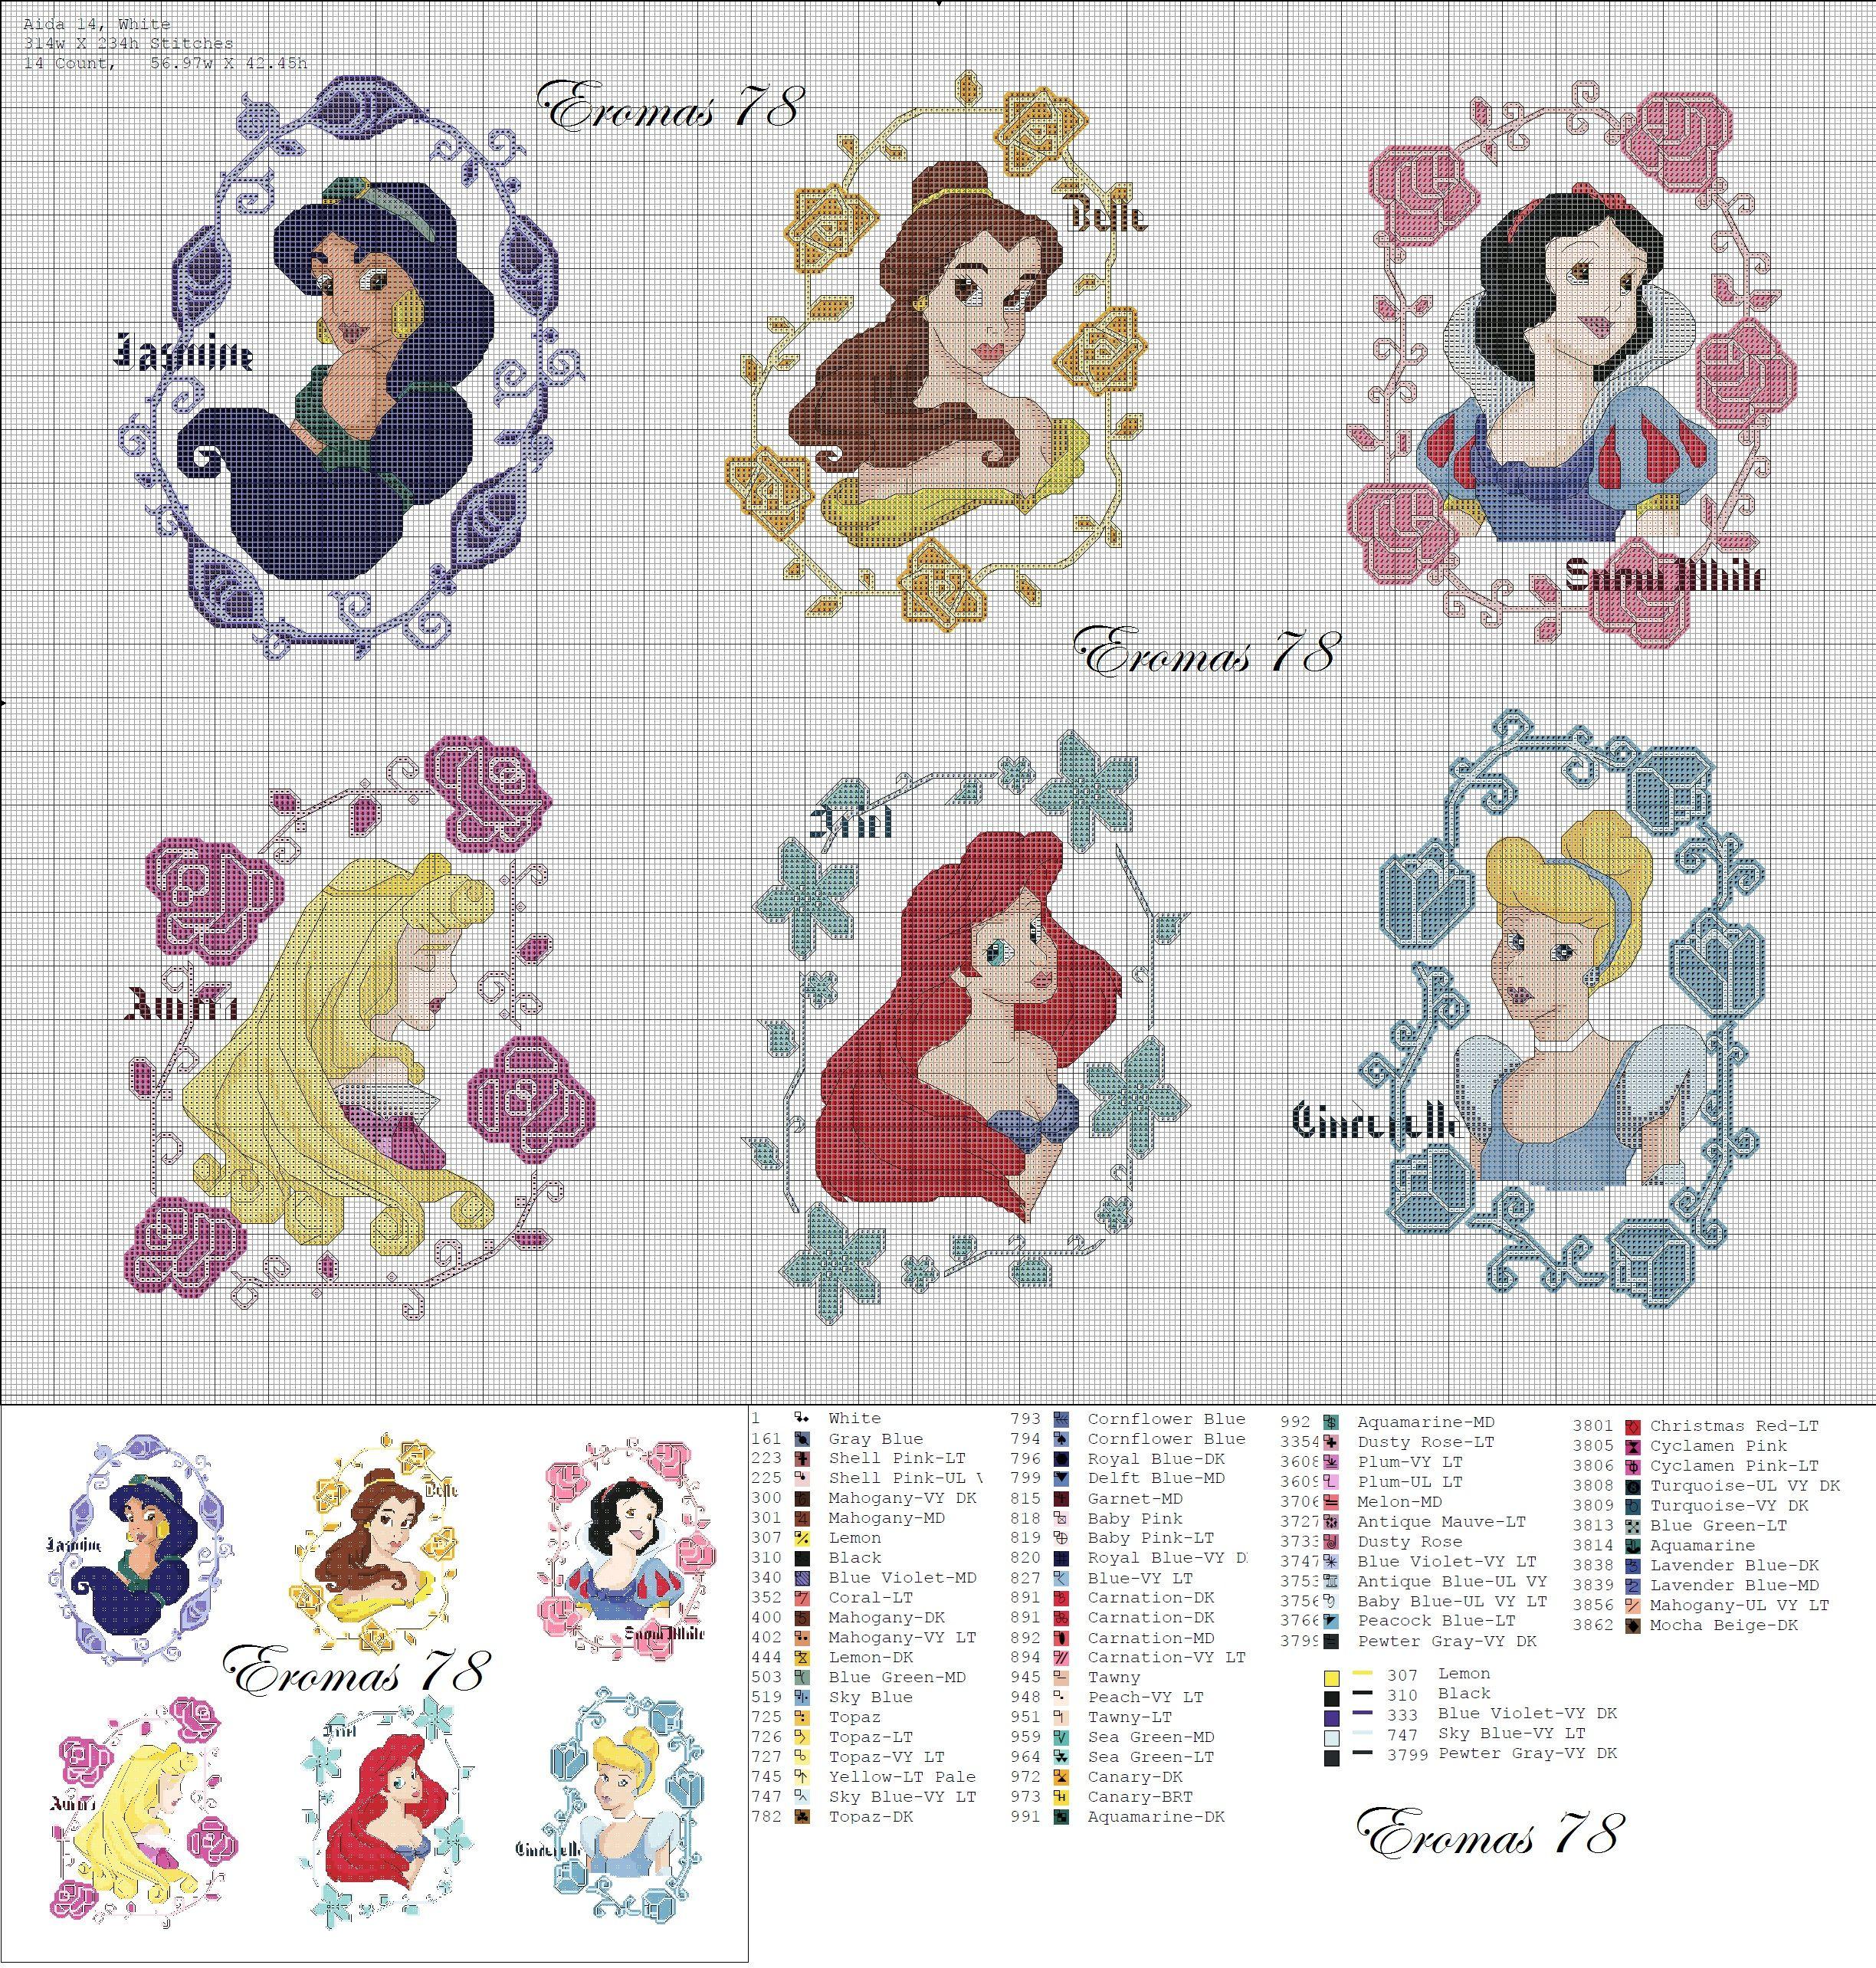 Disney Princess cross stitch portraits | kruisie steek | Pinterest ...